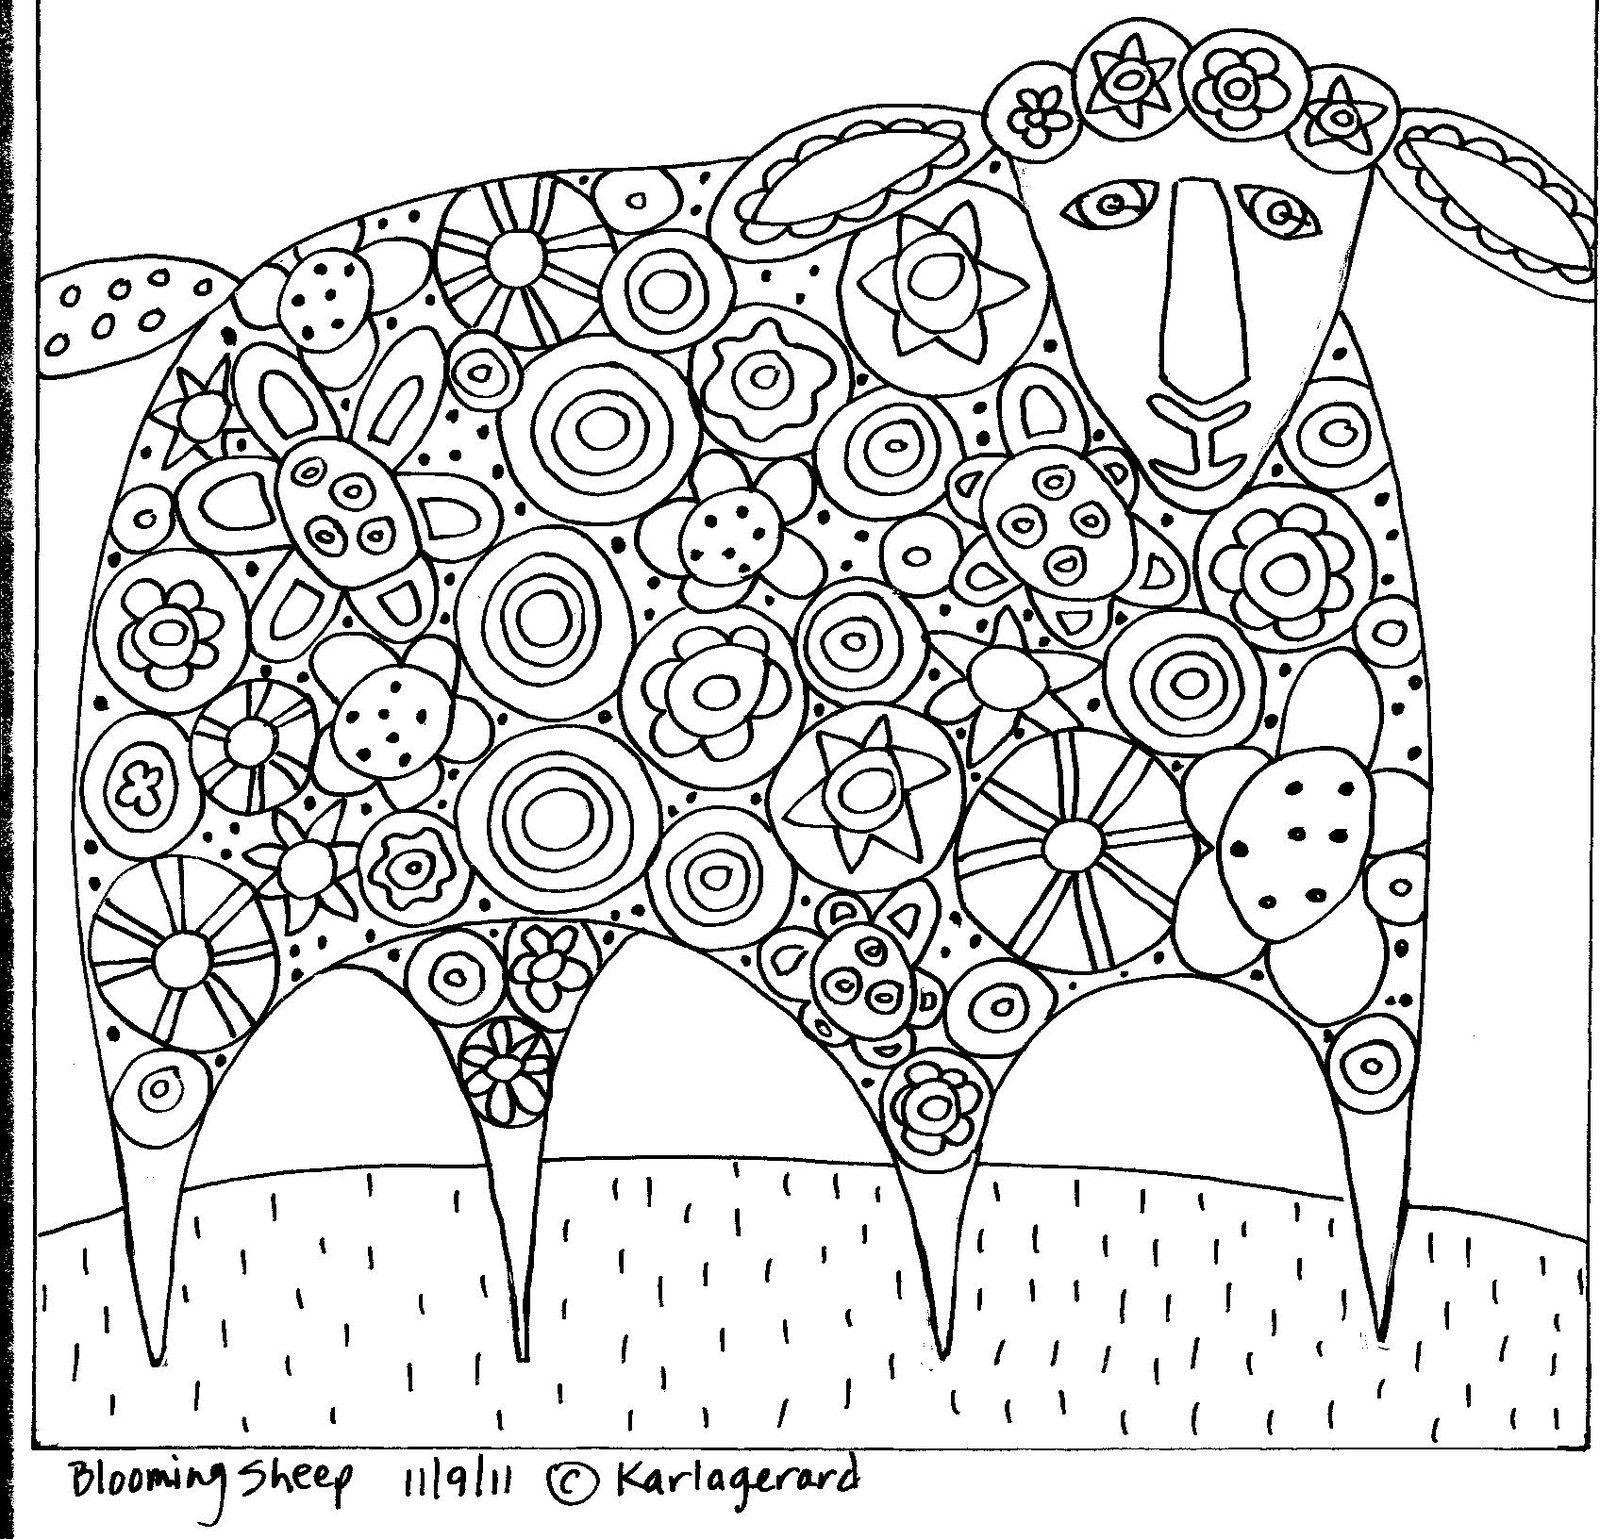 Rug Hook Paper Pattern Blooming Sheep Folk Art Abstract Unique Modern Karla G